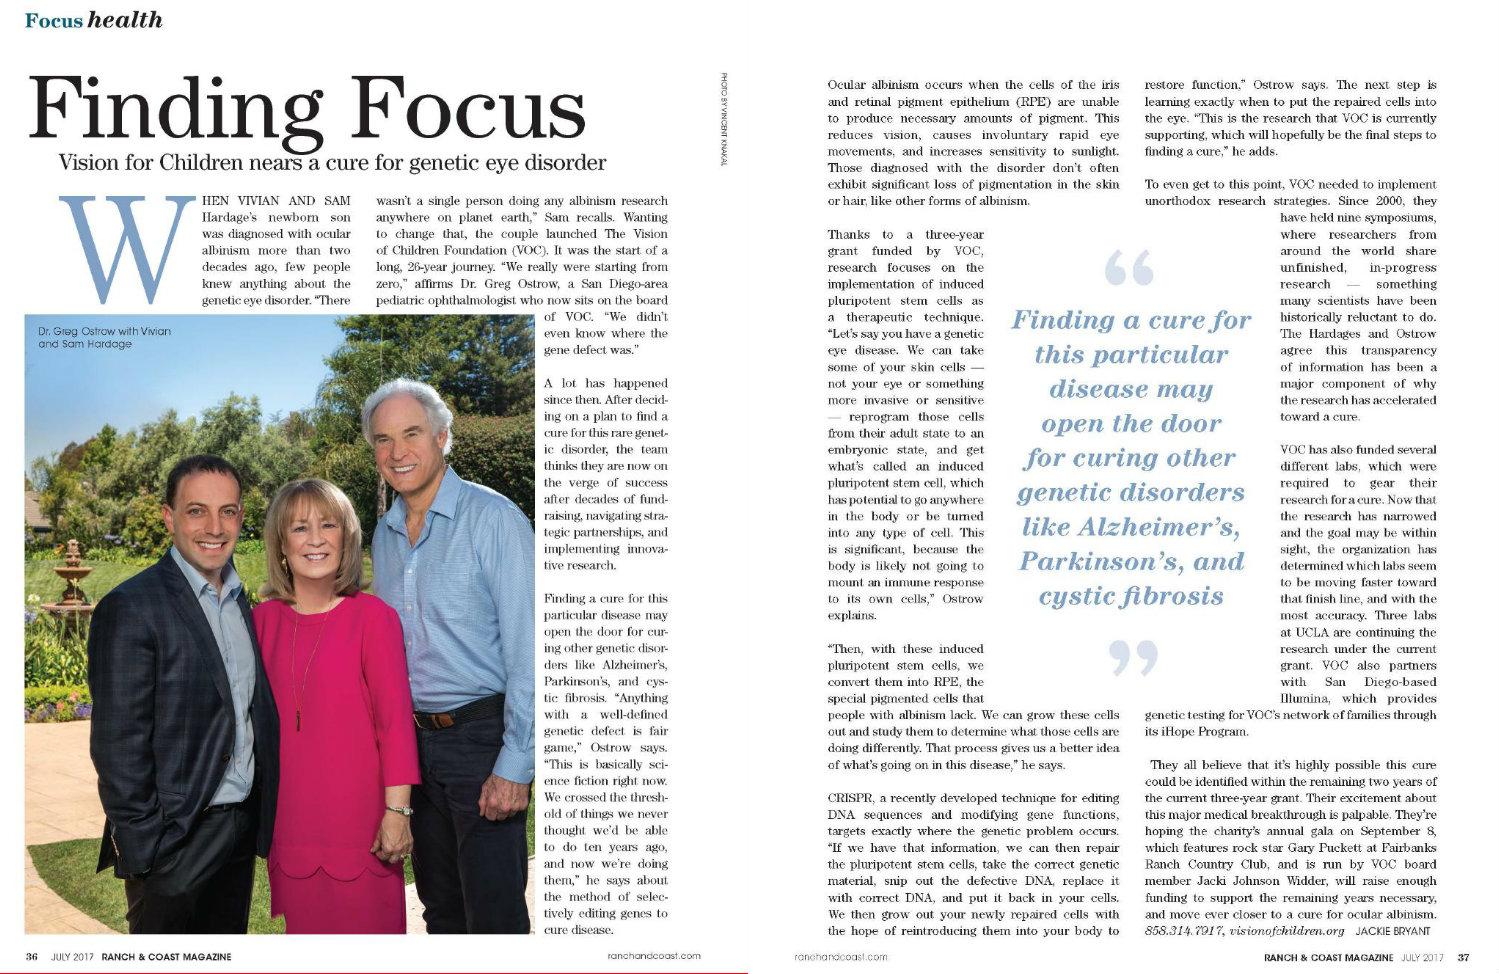 Ranch and Coast Magazine, July 2017